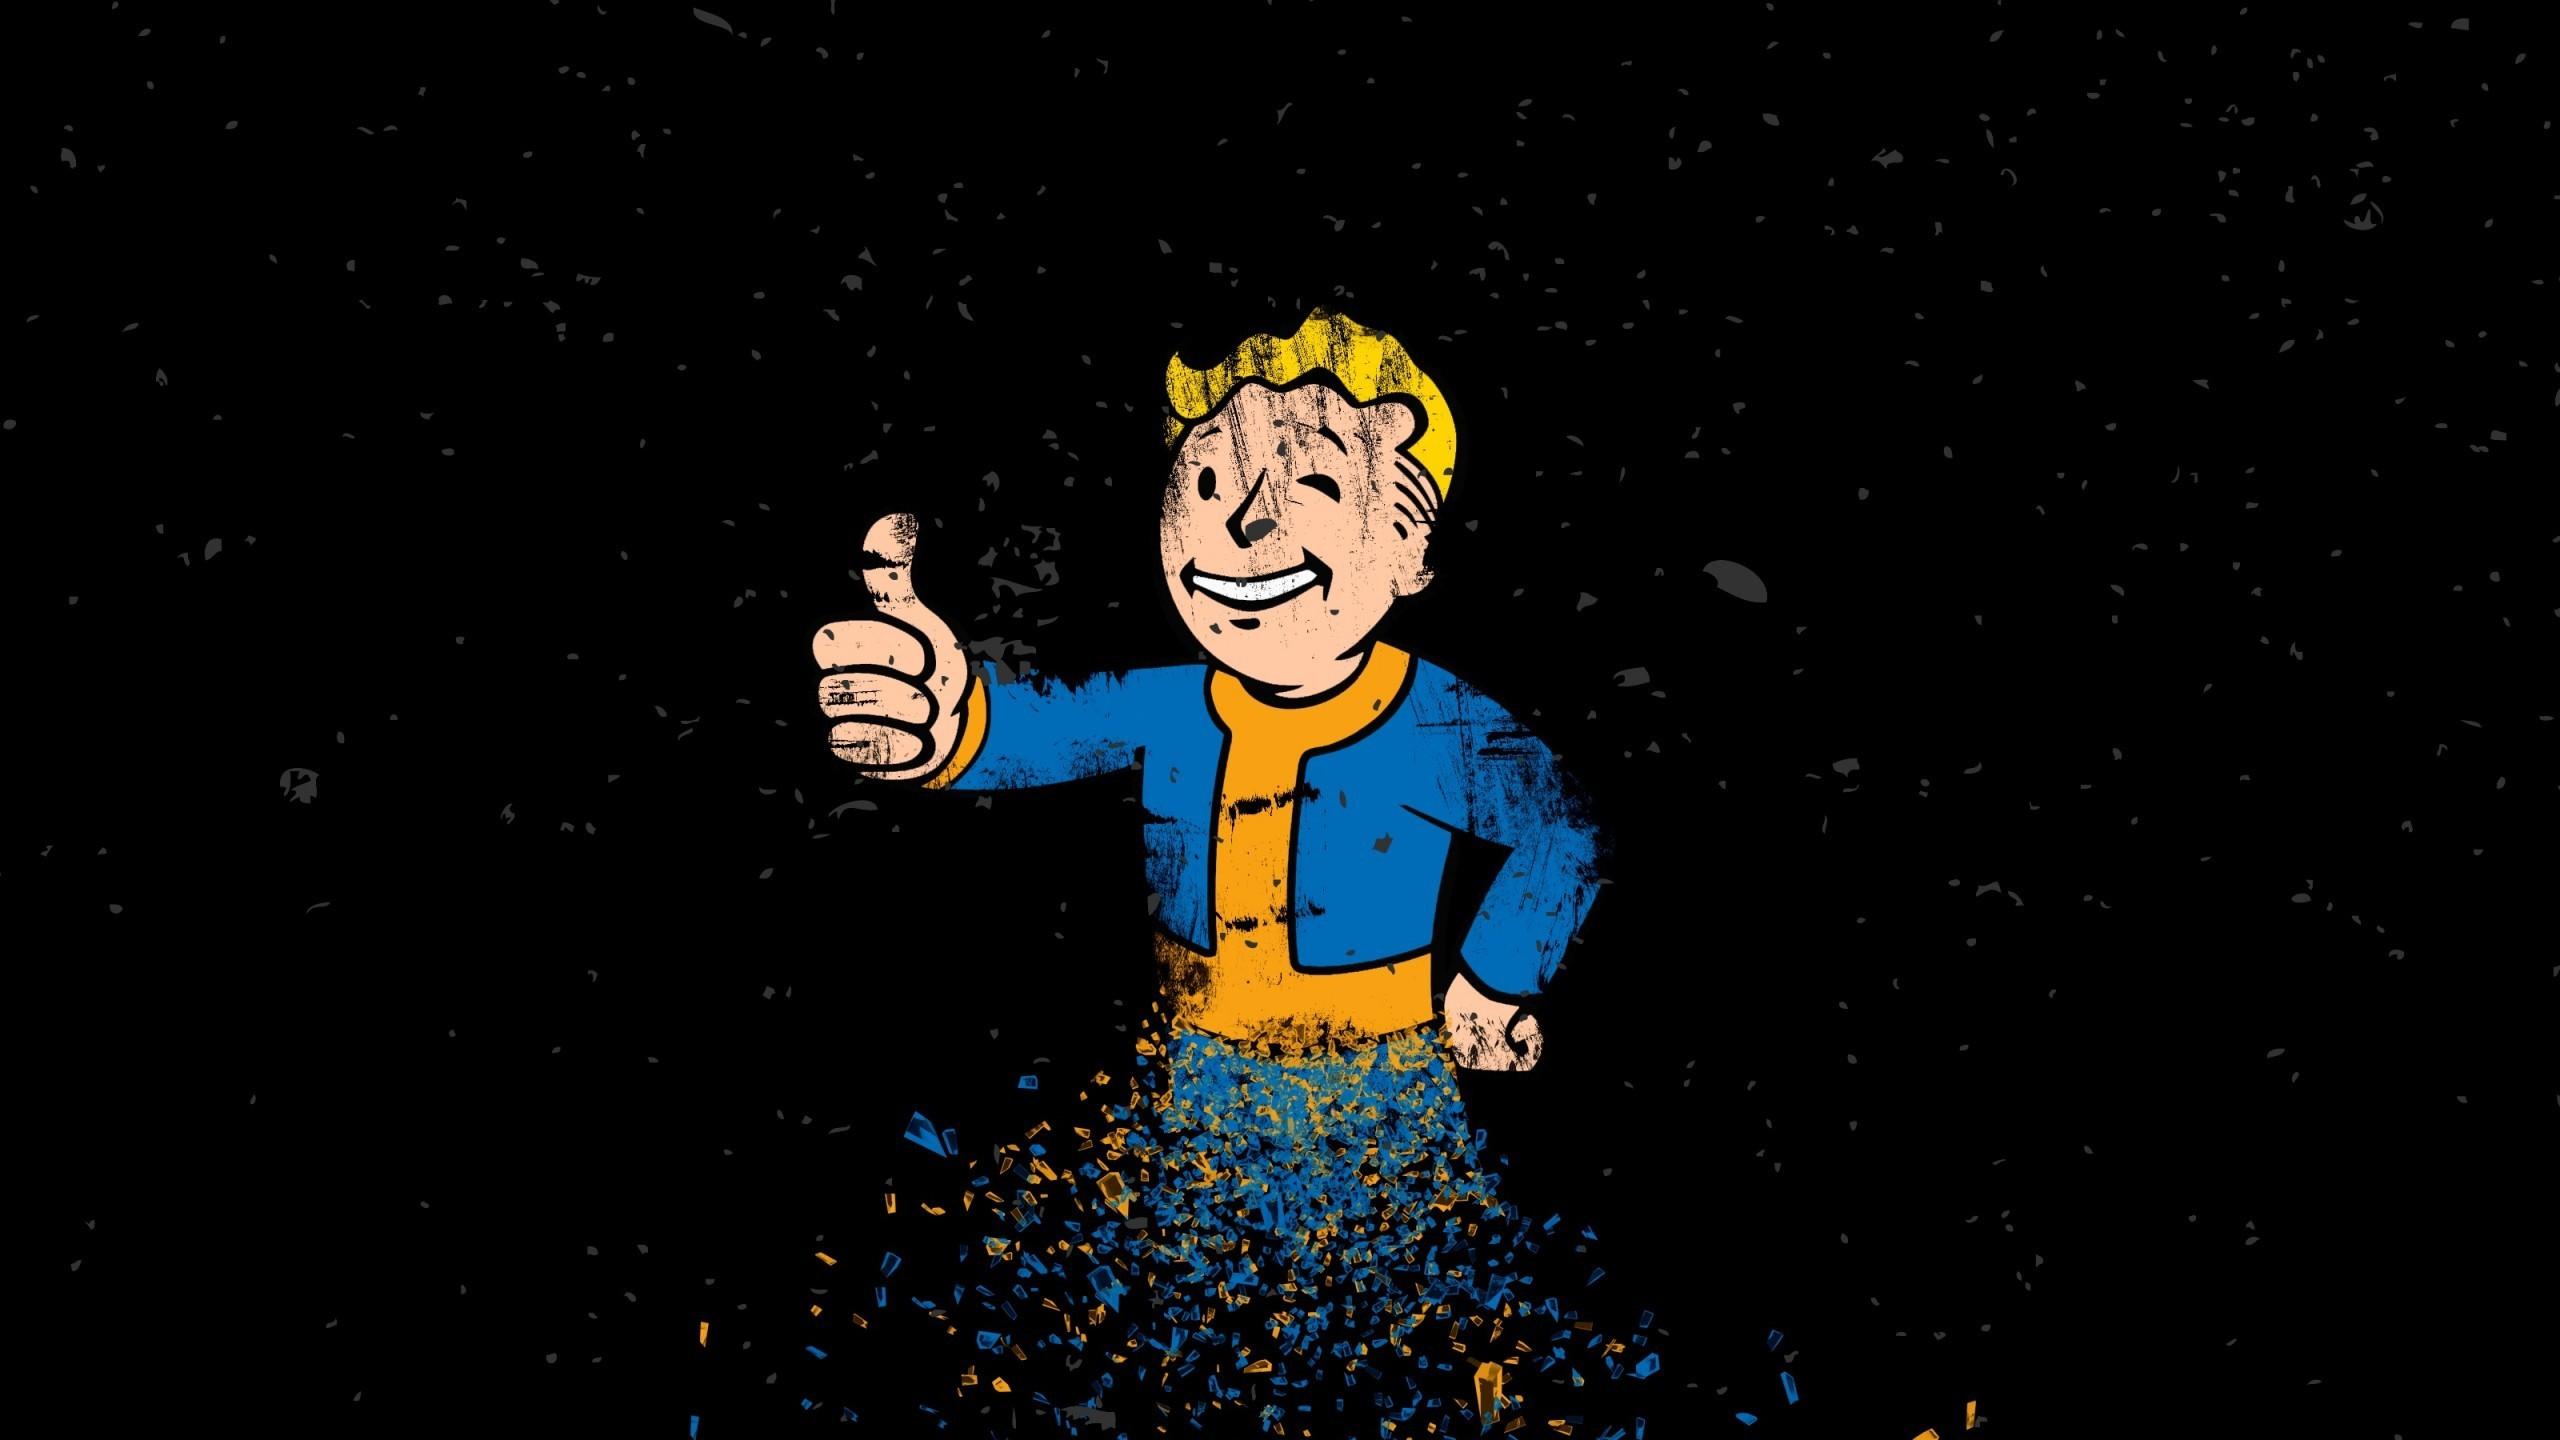 Simple Wallpaper Logo Fallout 4 - illustration-cartoon-Fallout-Fallout-4-Vault-Boy-darkness-screenshot-computer-wallpaper-album-cover-75486  Graphic_39486.jpg